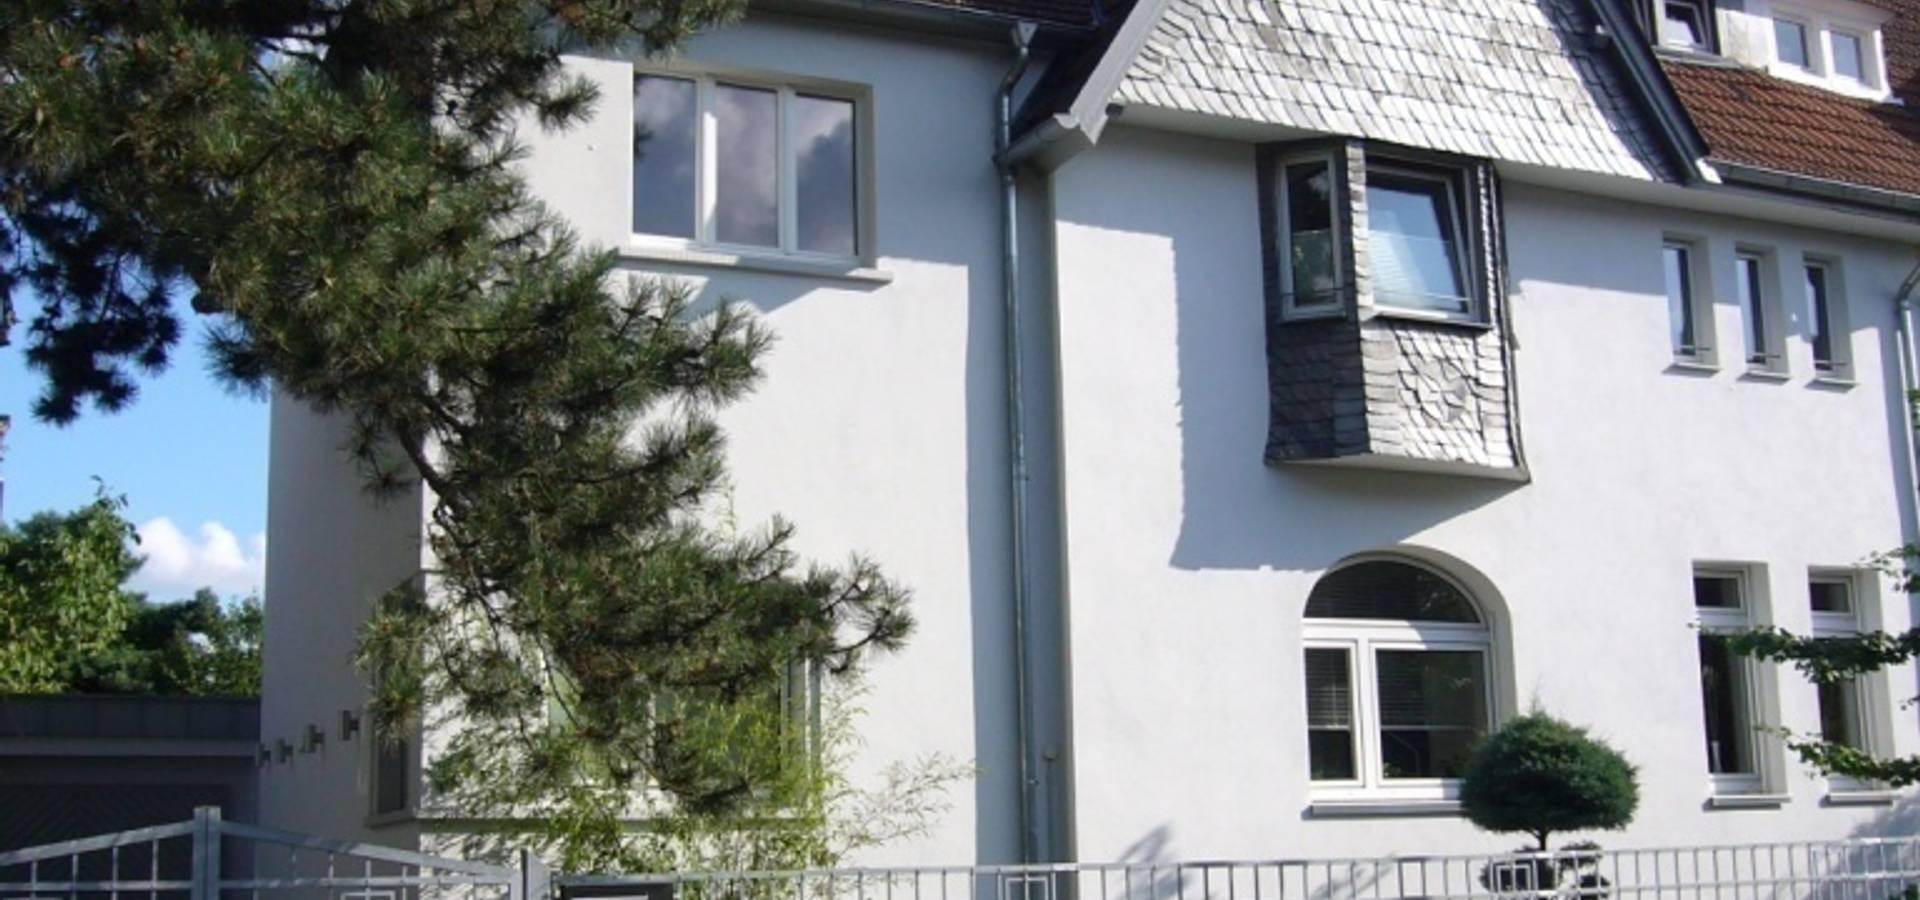 Innenarchitektur Wiesbaden privathaus wiesbaden dachgeschoss by ketterer innenarchitektur homify